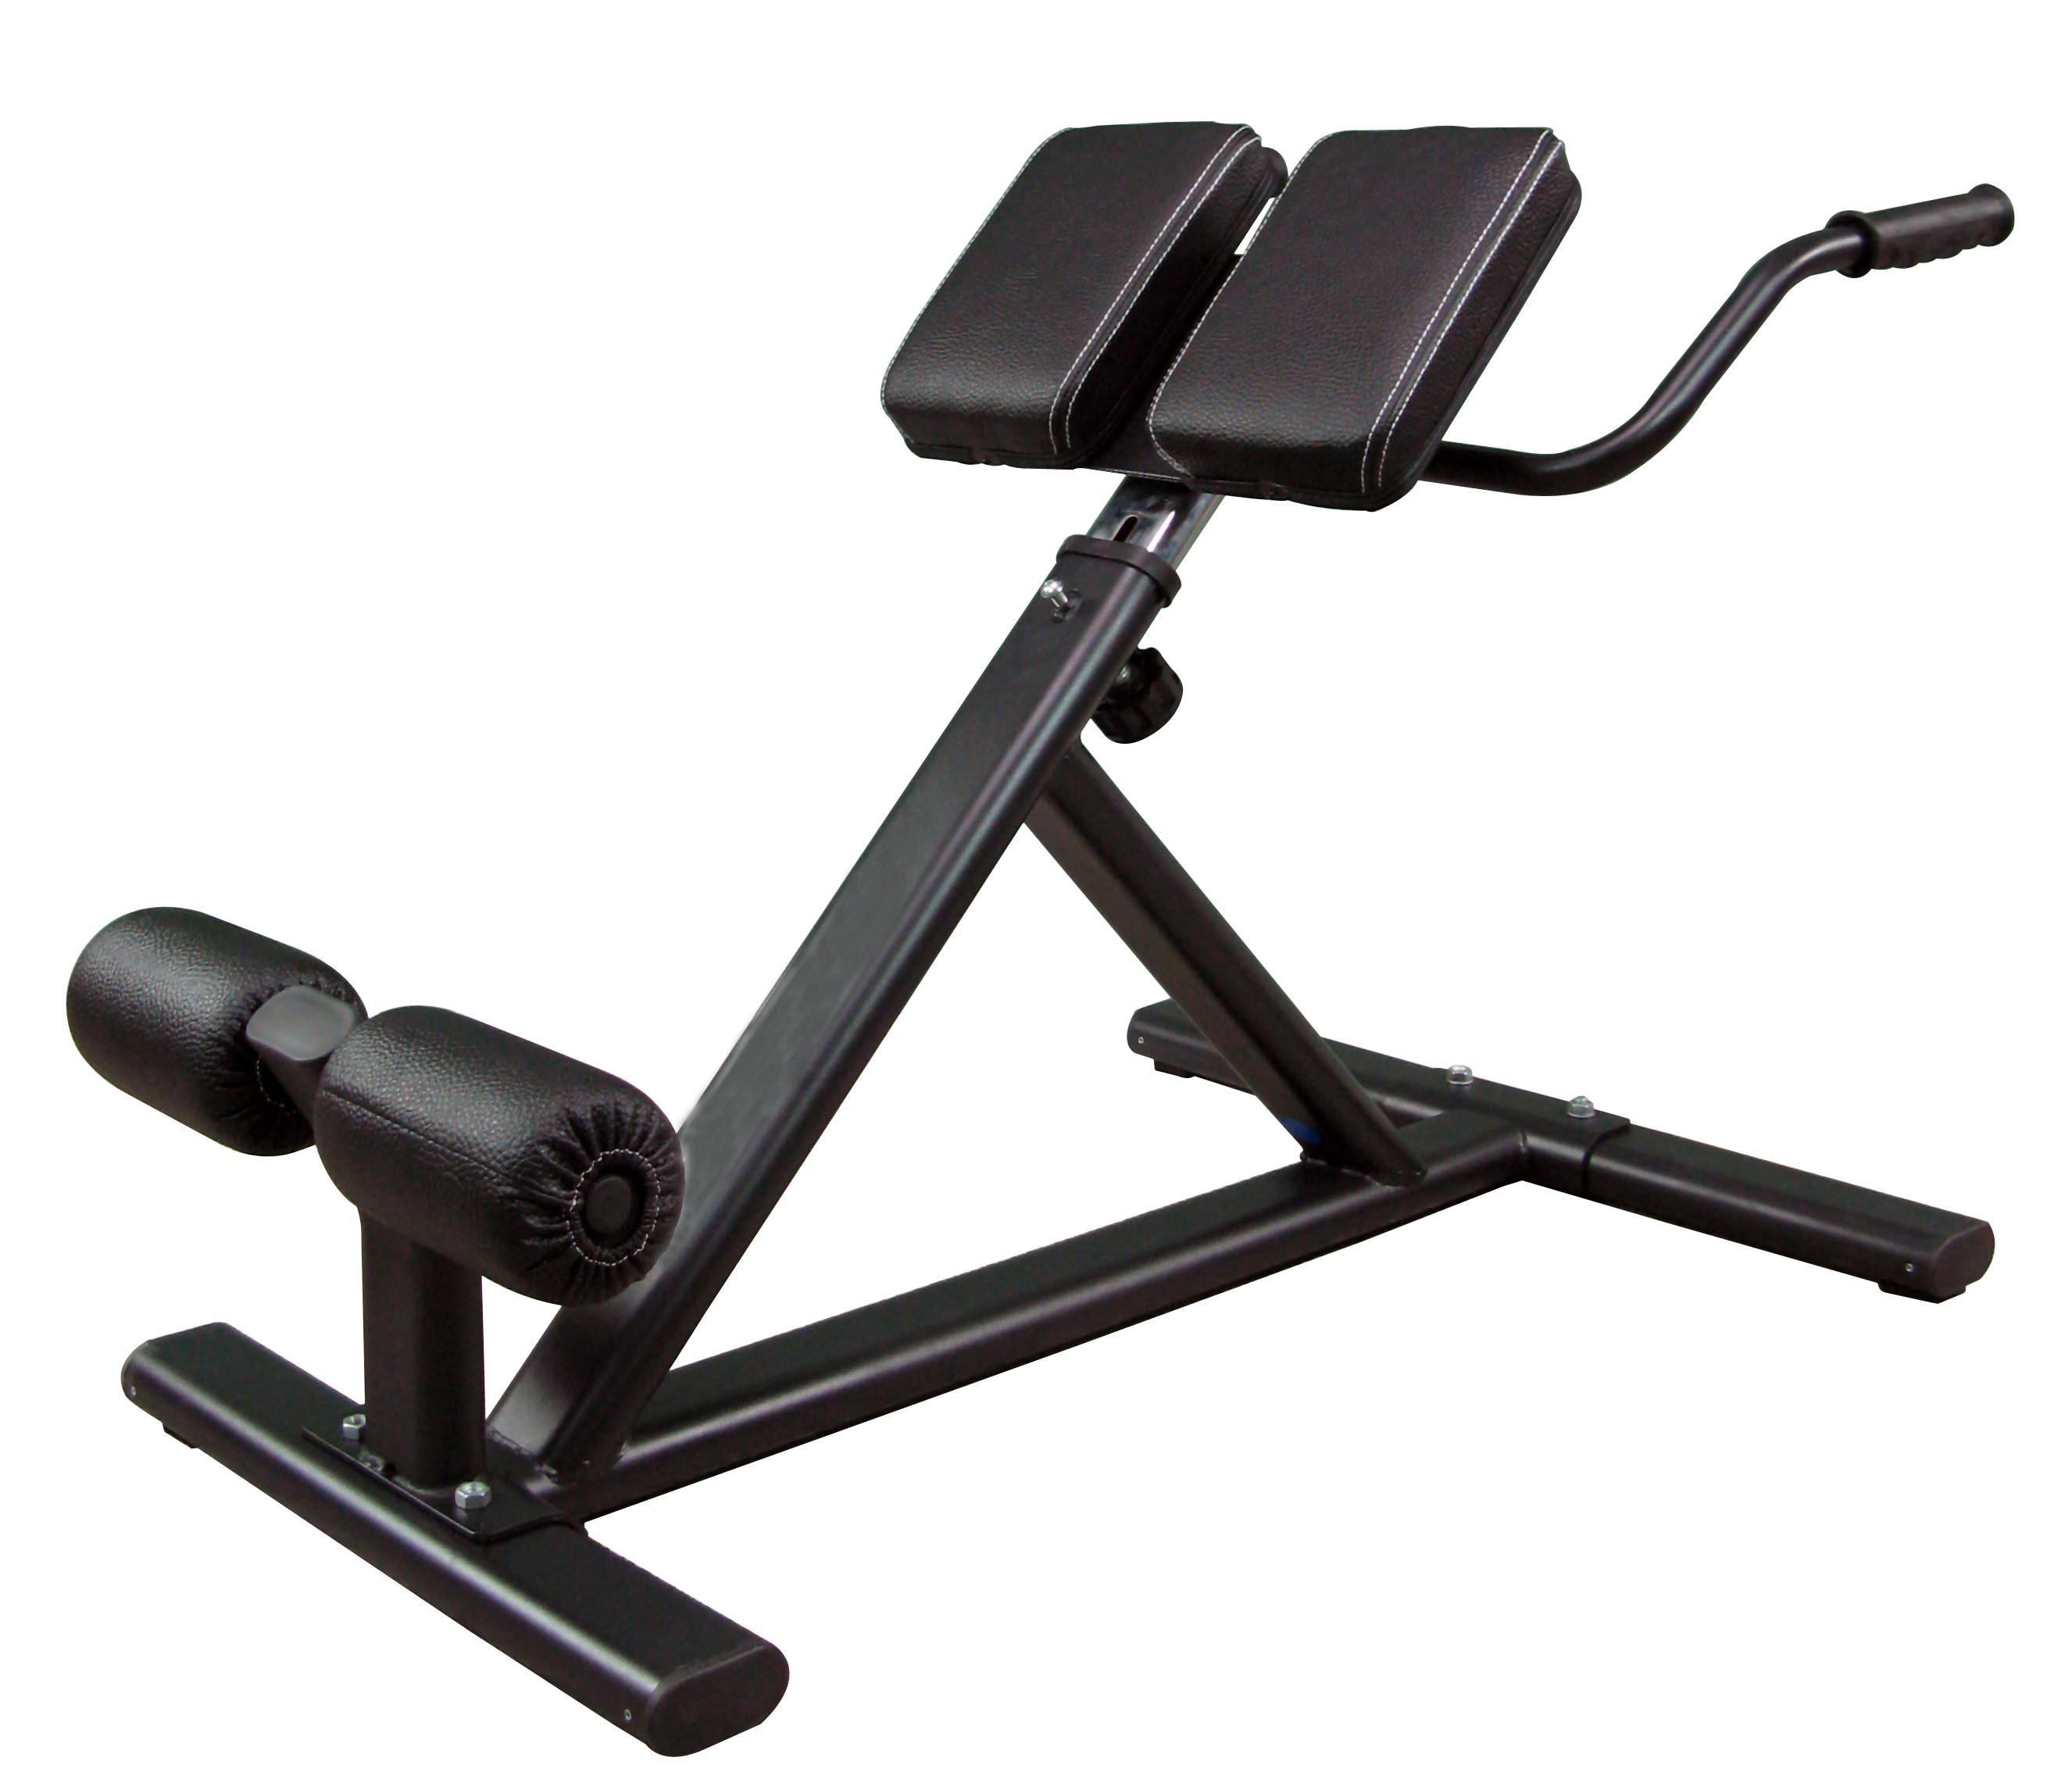 China Fitness Equipment Hyper Bench Gym Equipment Bnech Roman